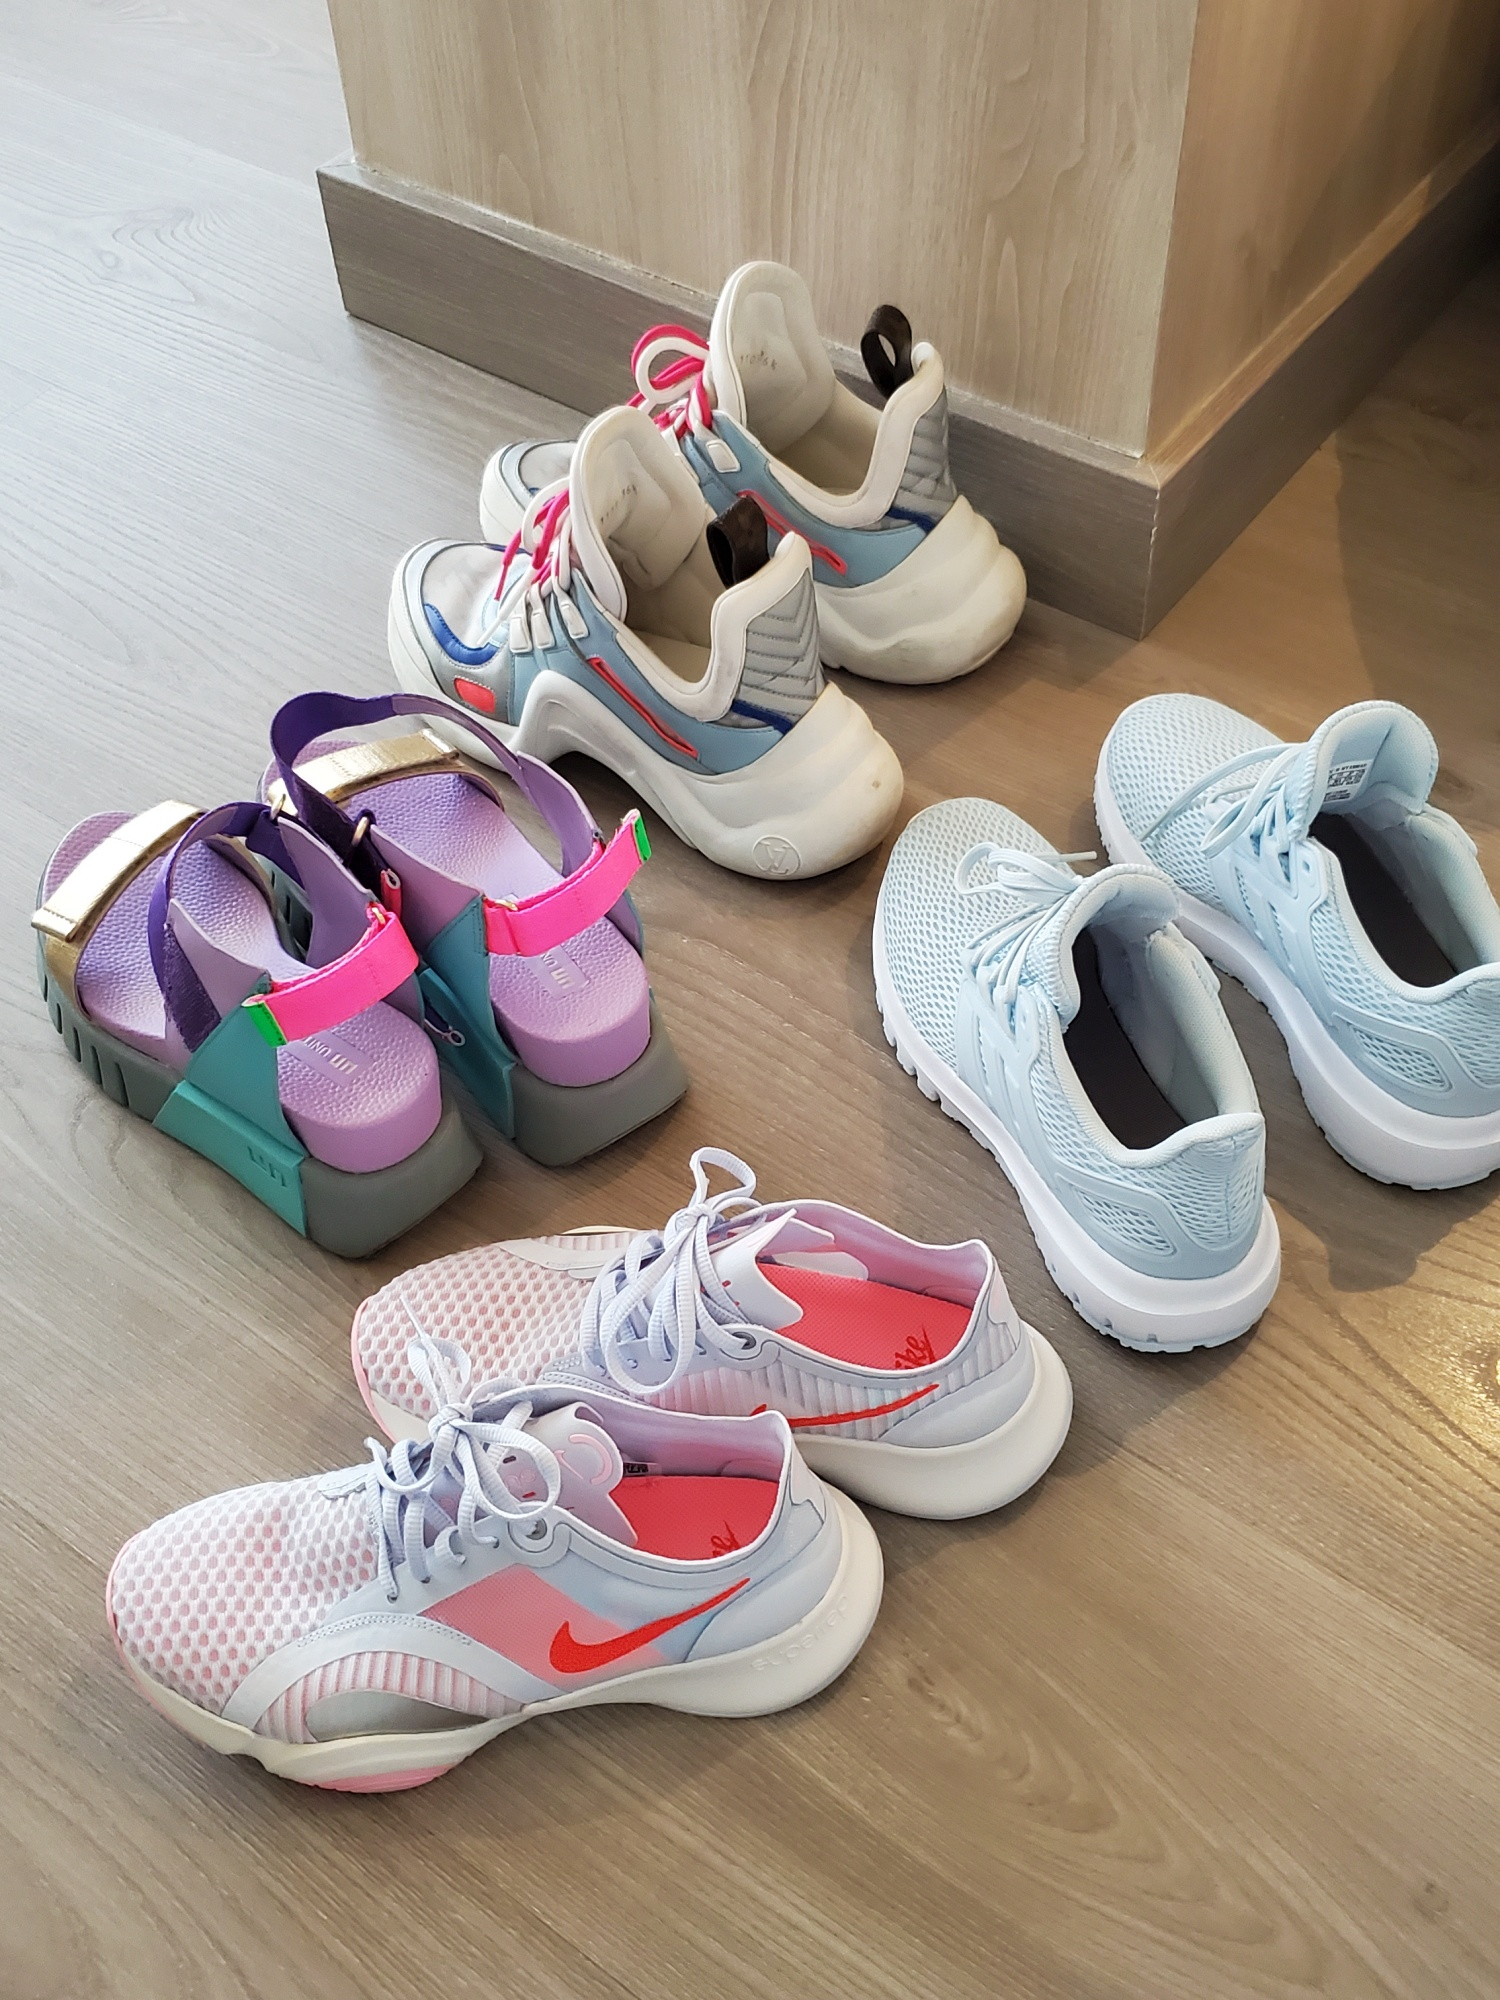 leftbanked shoes